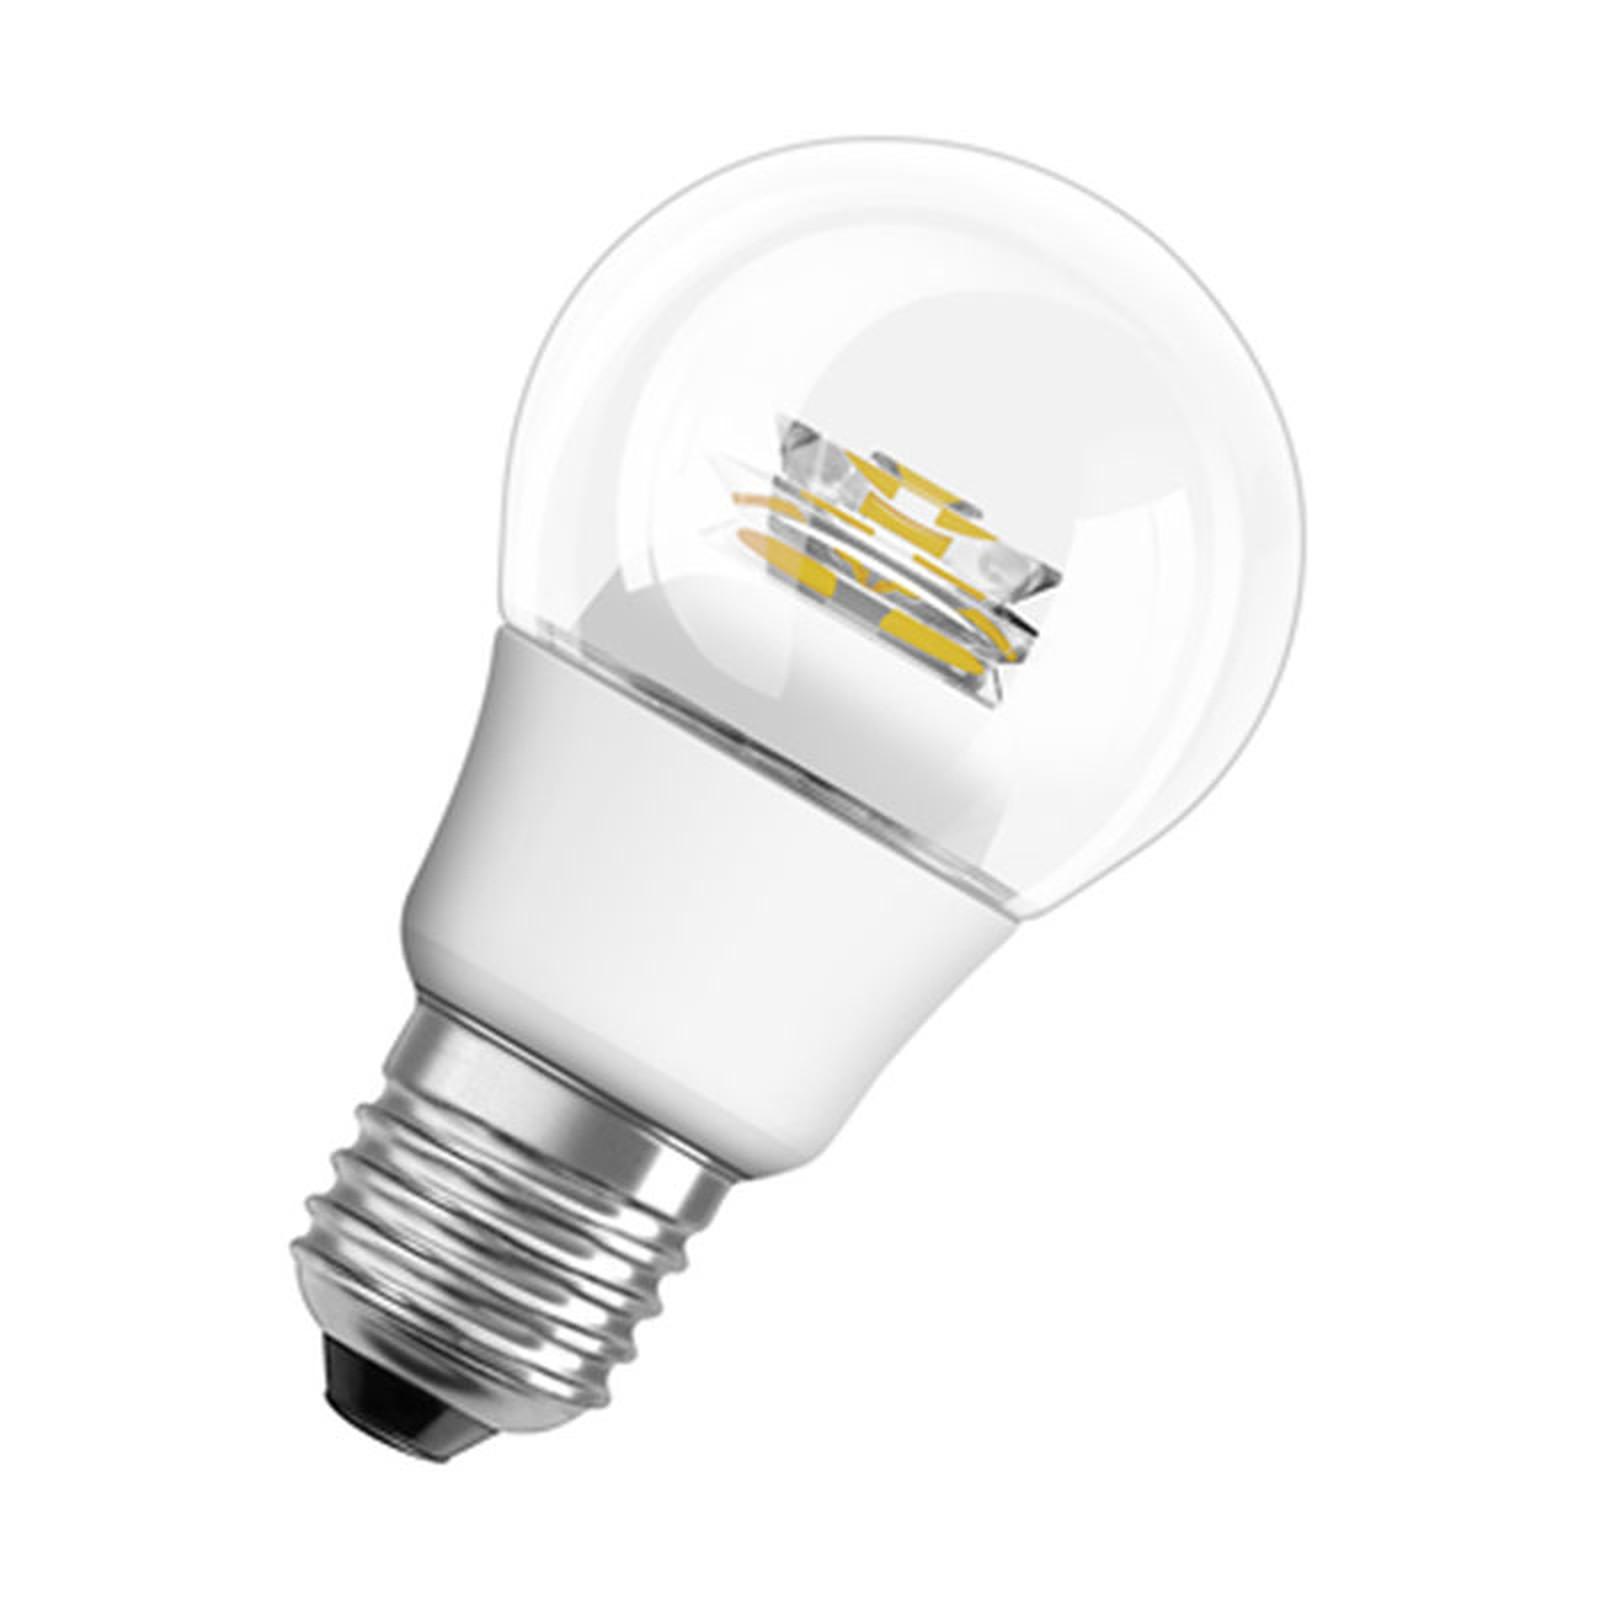 Osram Ampoule Led Retrofit Standard E27 4w 40w A: OSRAM Ampoule LED Star Classic Standard E27 6W (40W) A